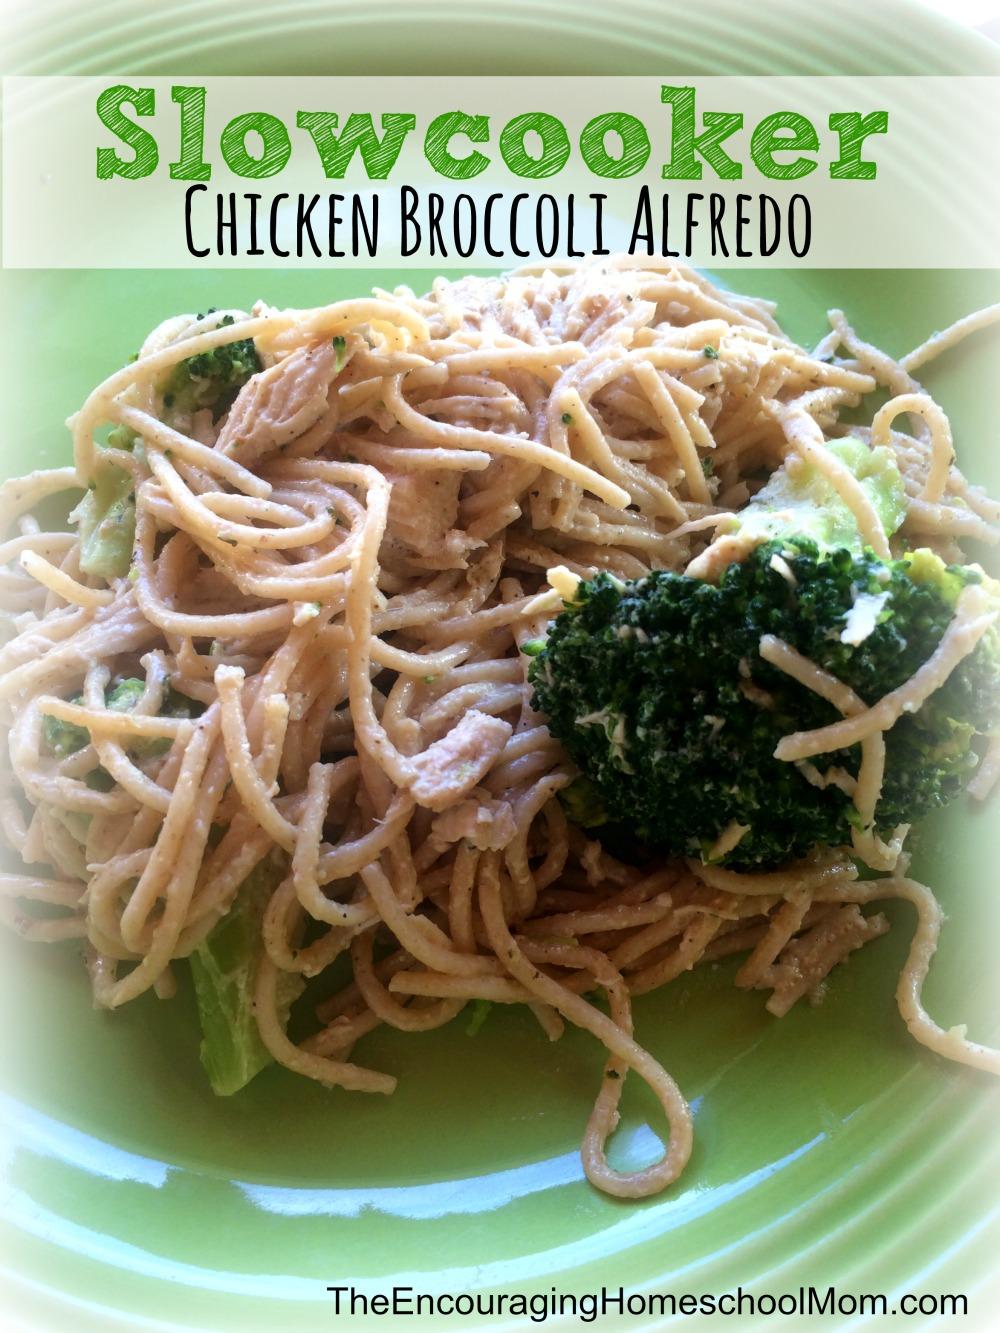 Slowcooker Chicken Broccoli Alfredo Recipe A Trim Healthy Mama Twist